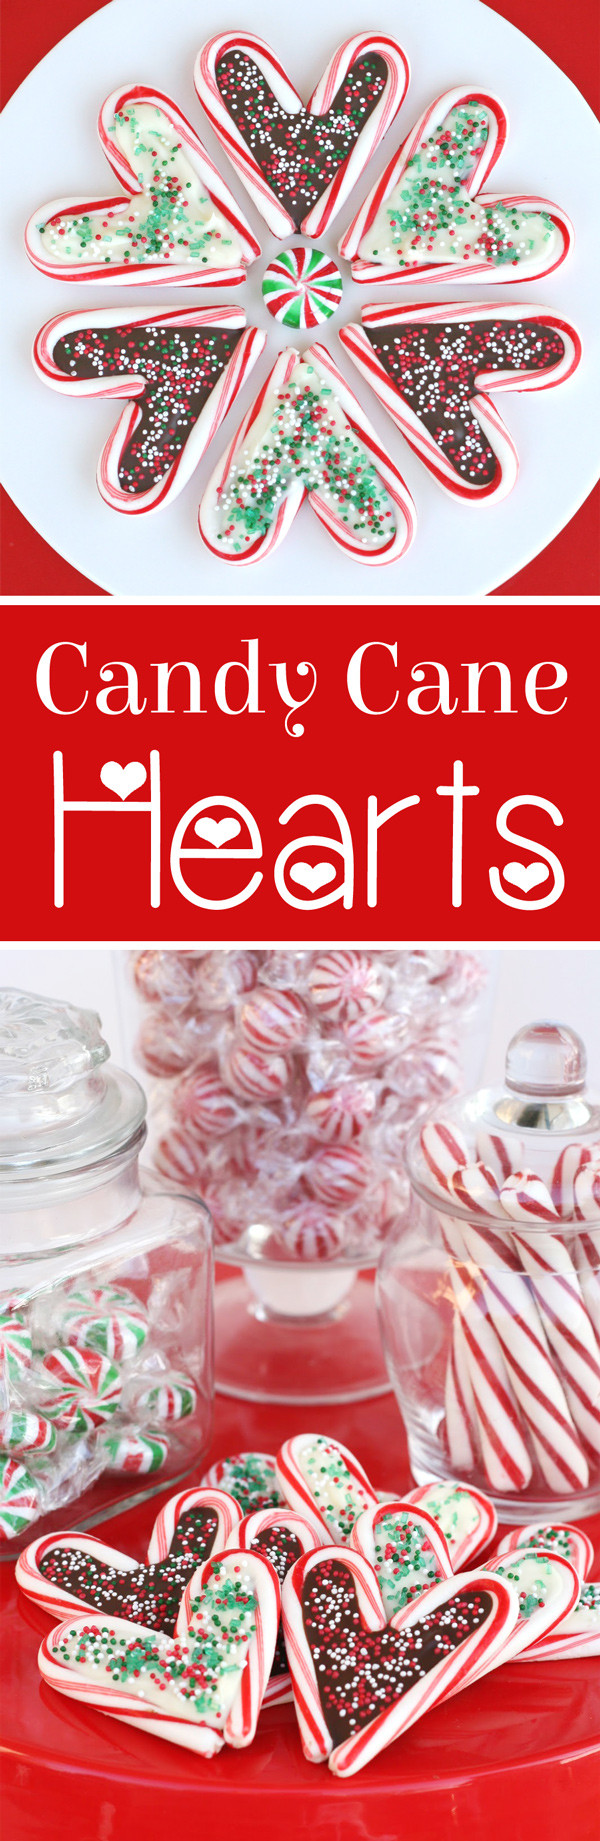 Heart Candy Christmas  Candy Cane Hearts – Glorious Treats